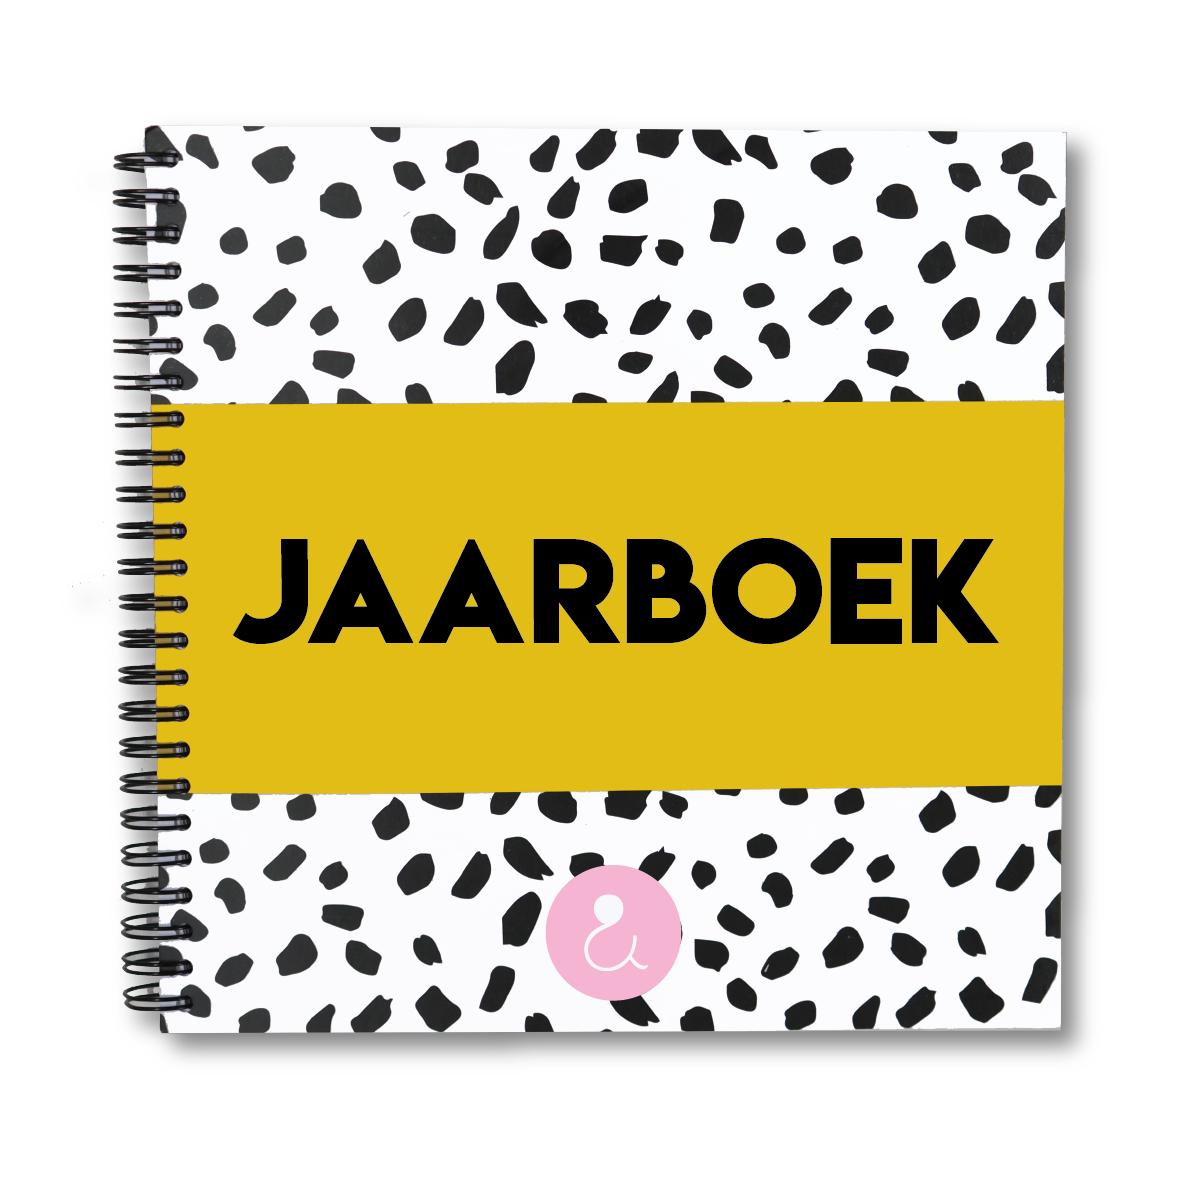 Jaarboek | okergeel